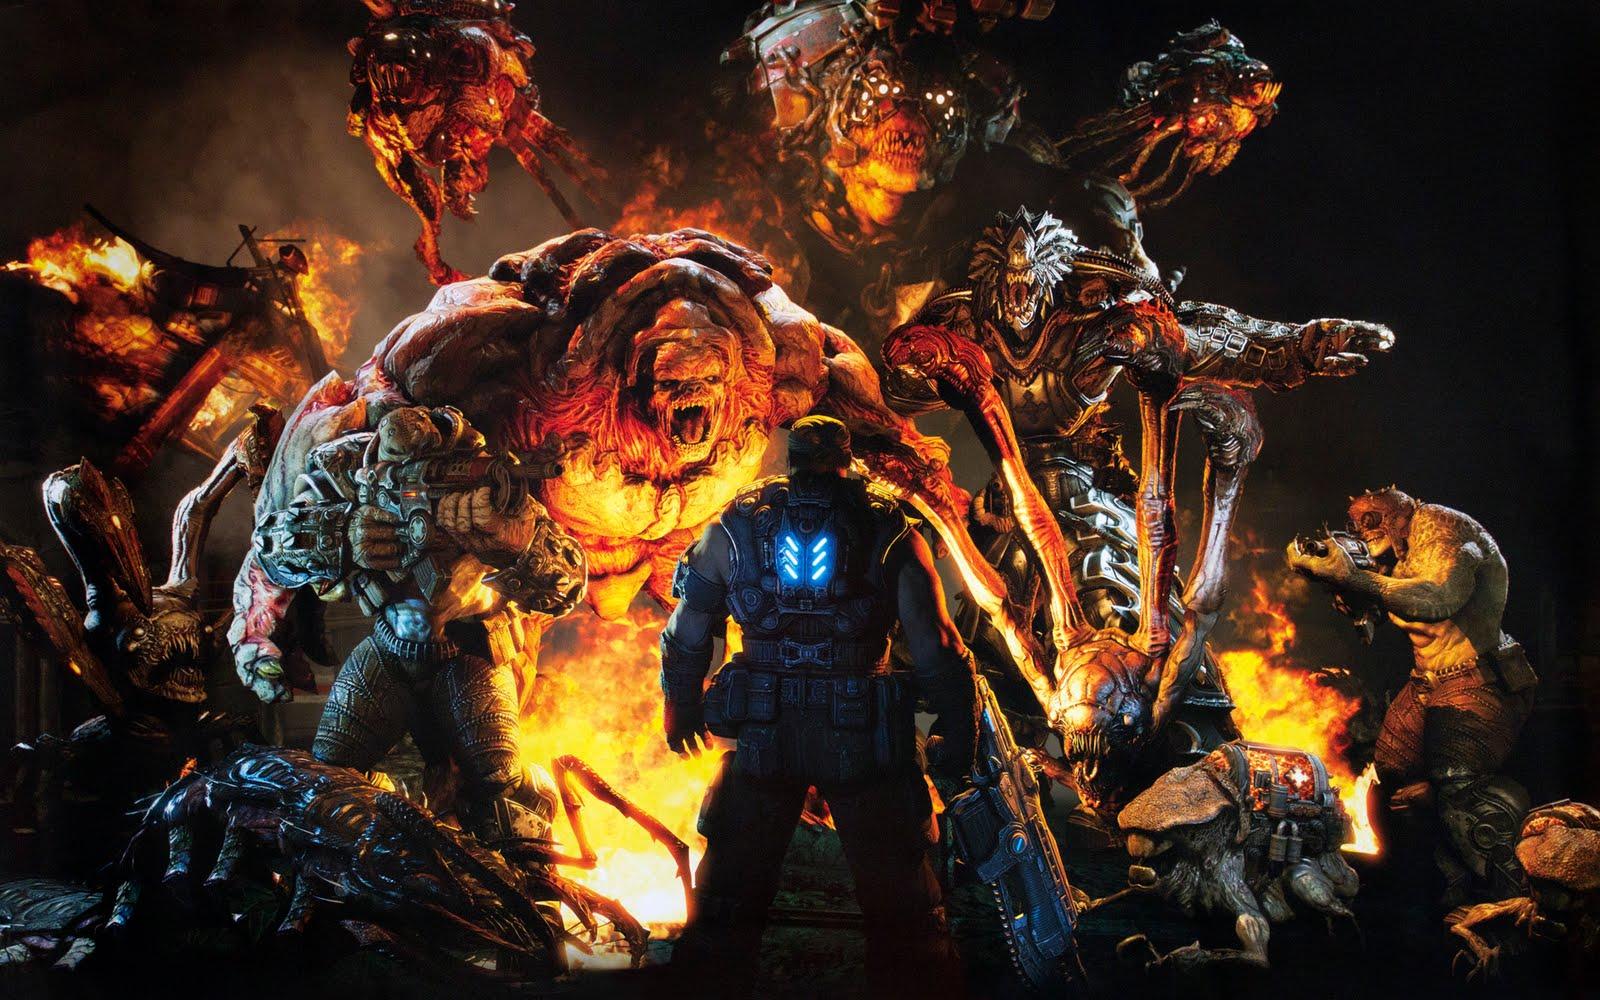 Gears of War 4 - перенос даты выхода